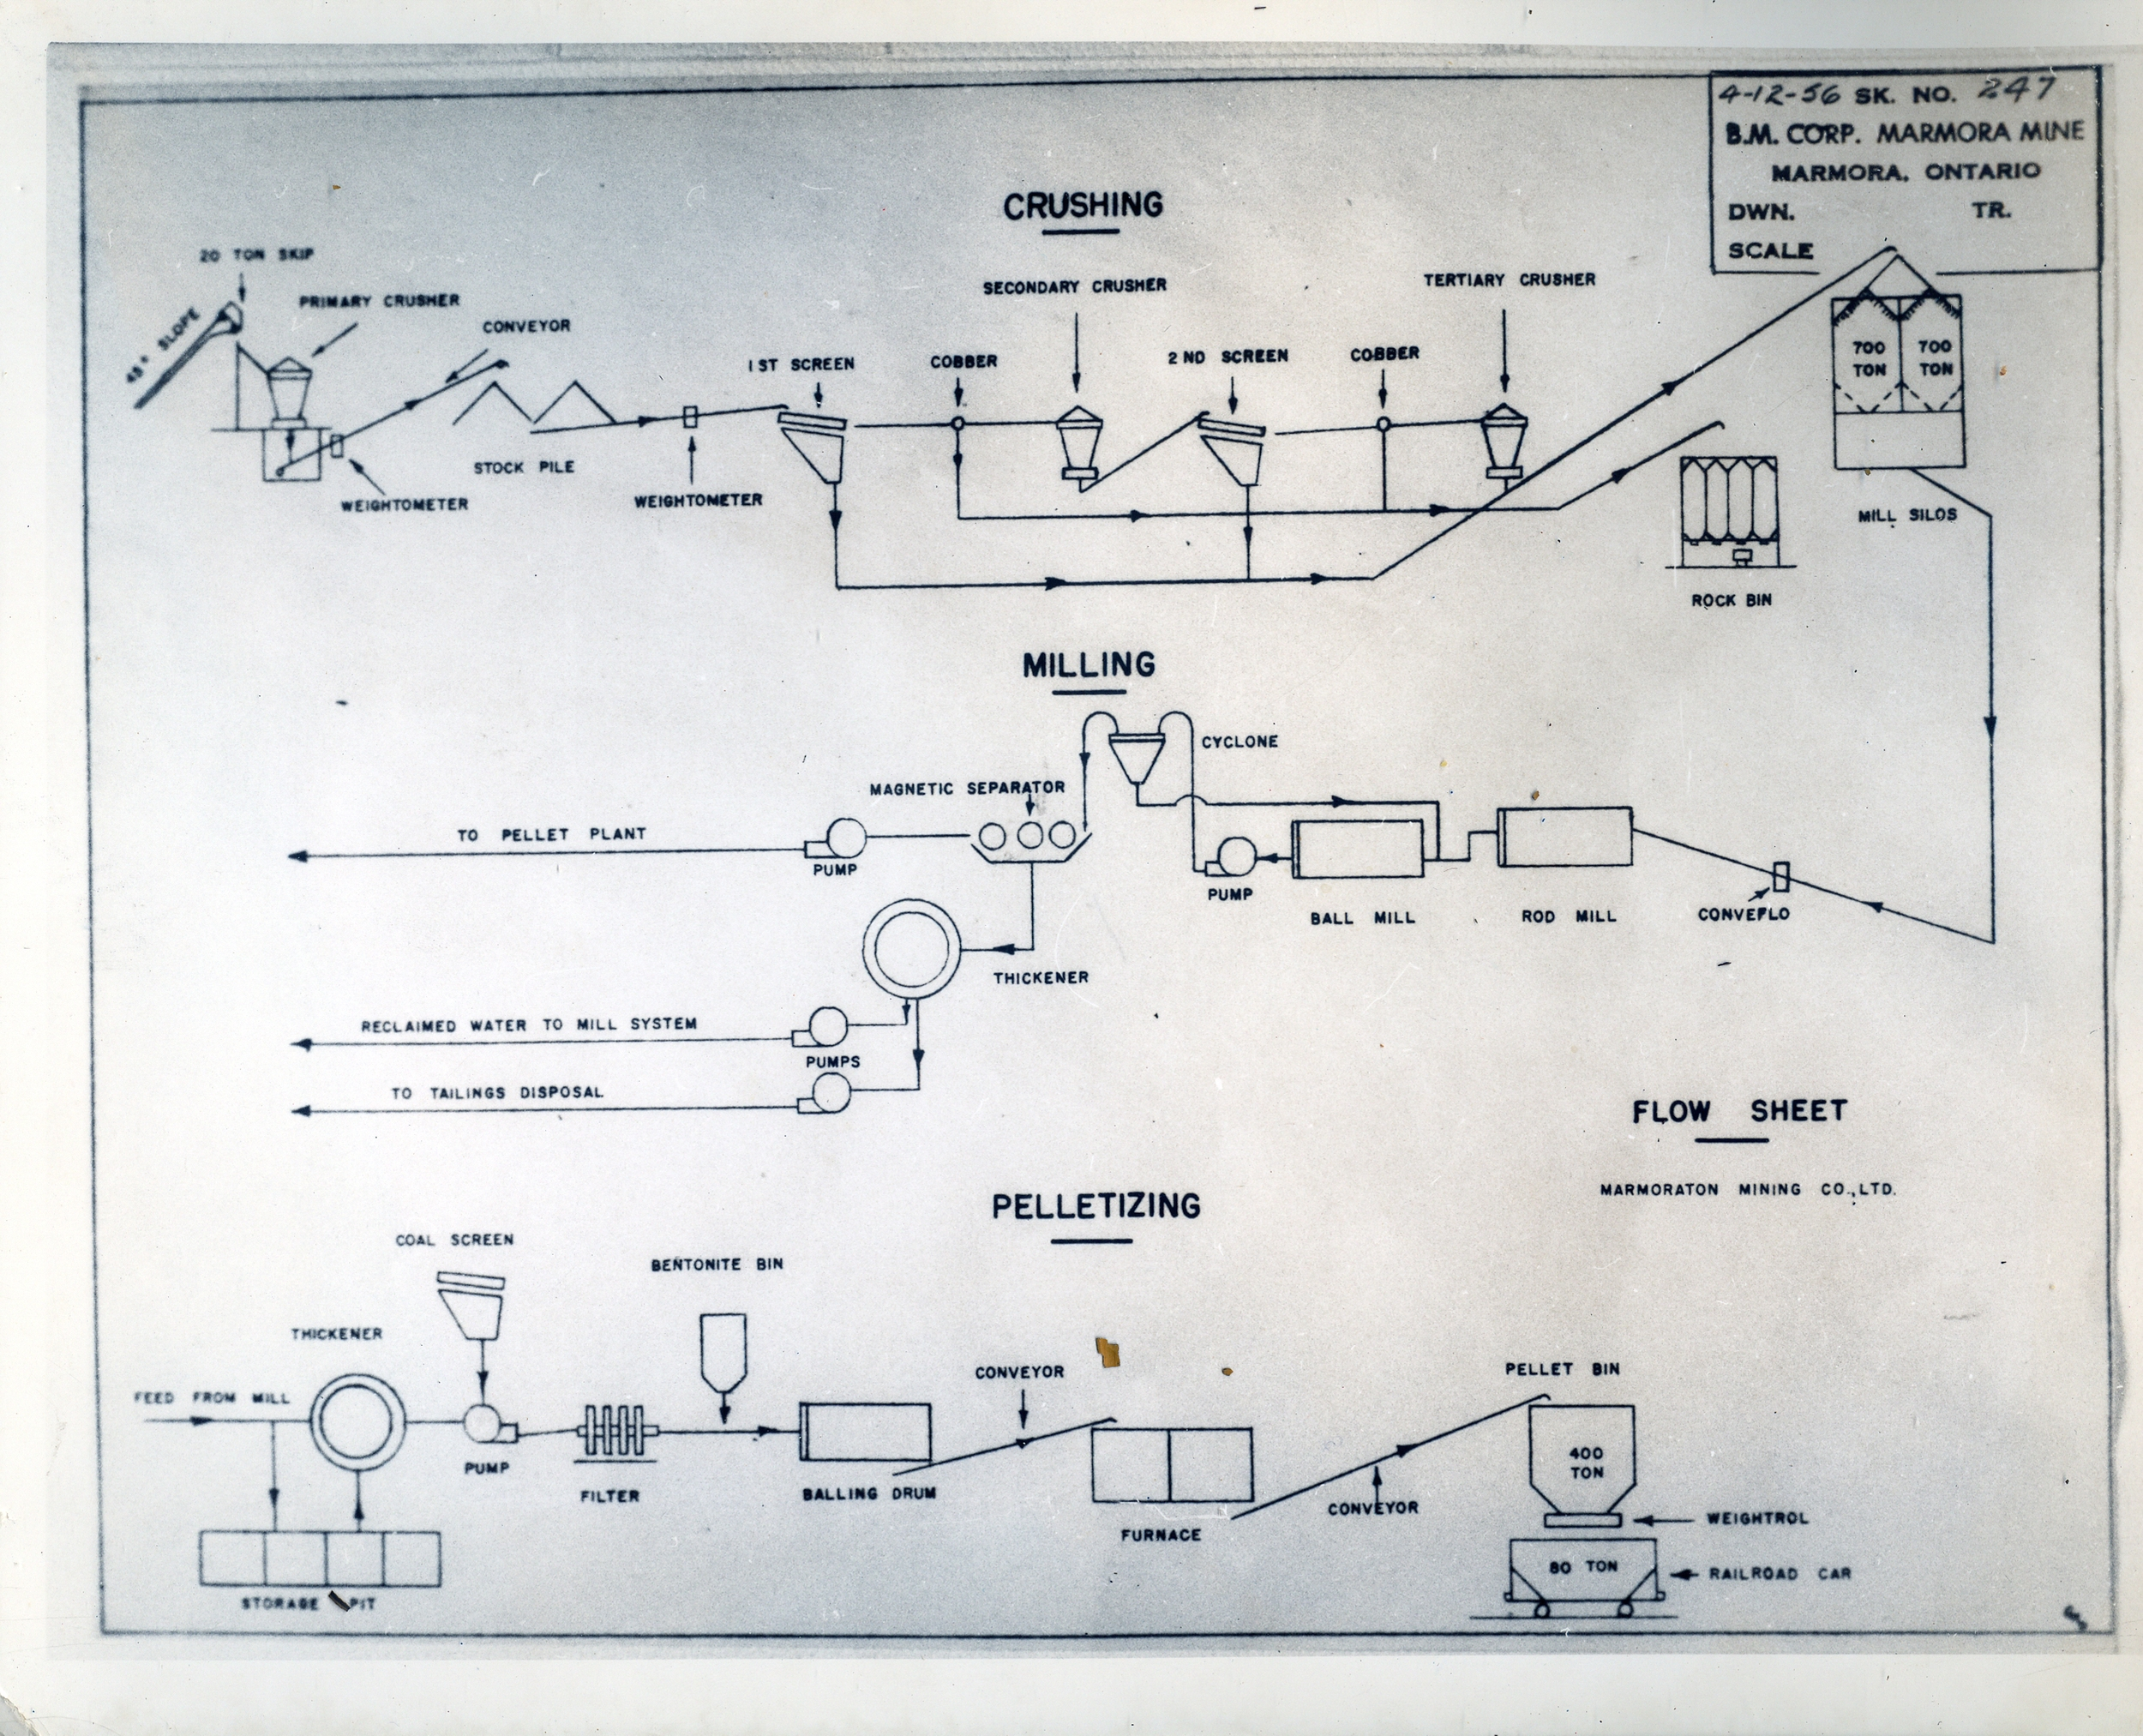 1956 Marmoraton Mine  schematic  Crushing,  milling & pelletizing